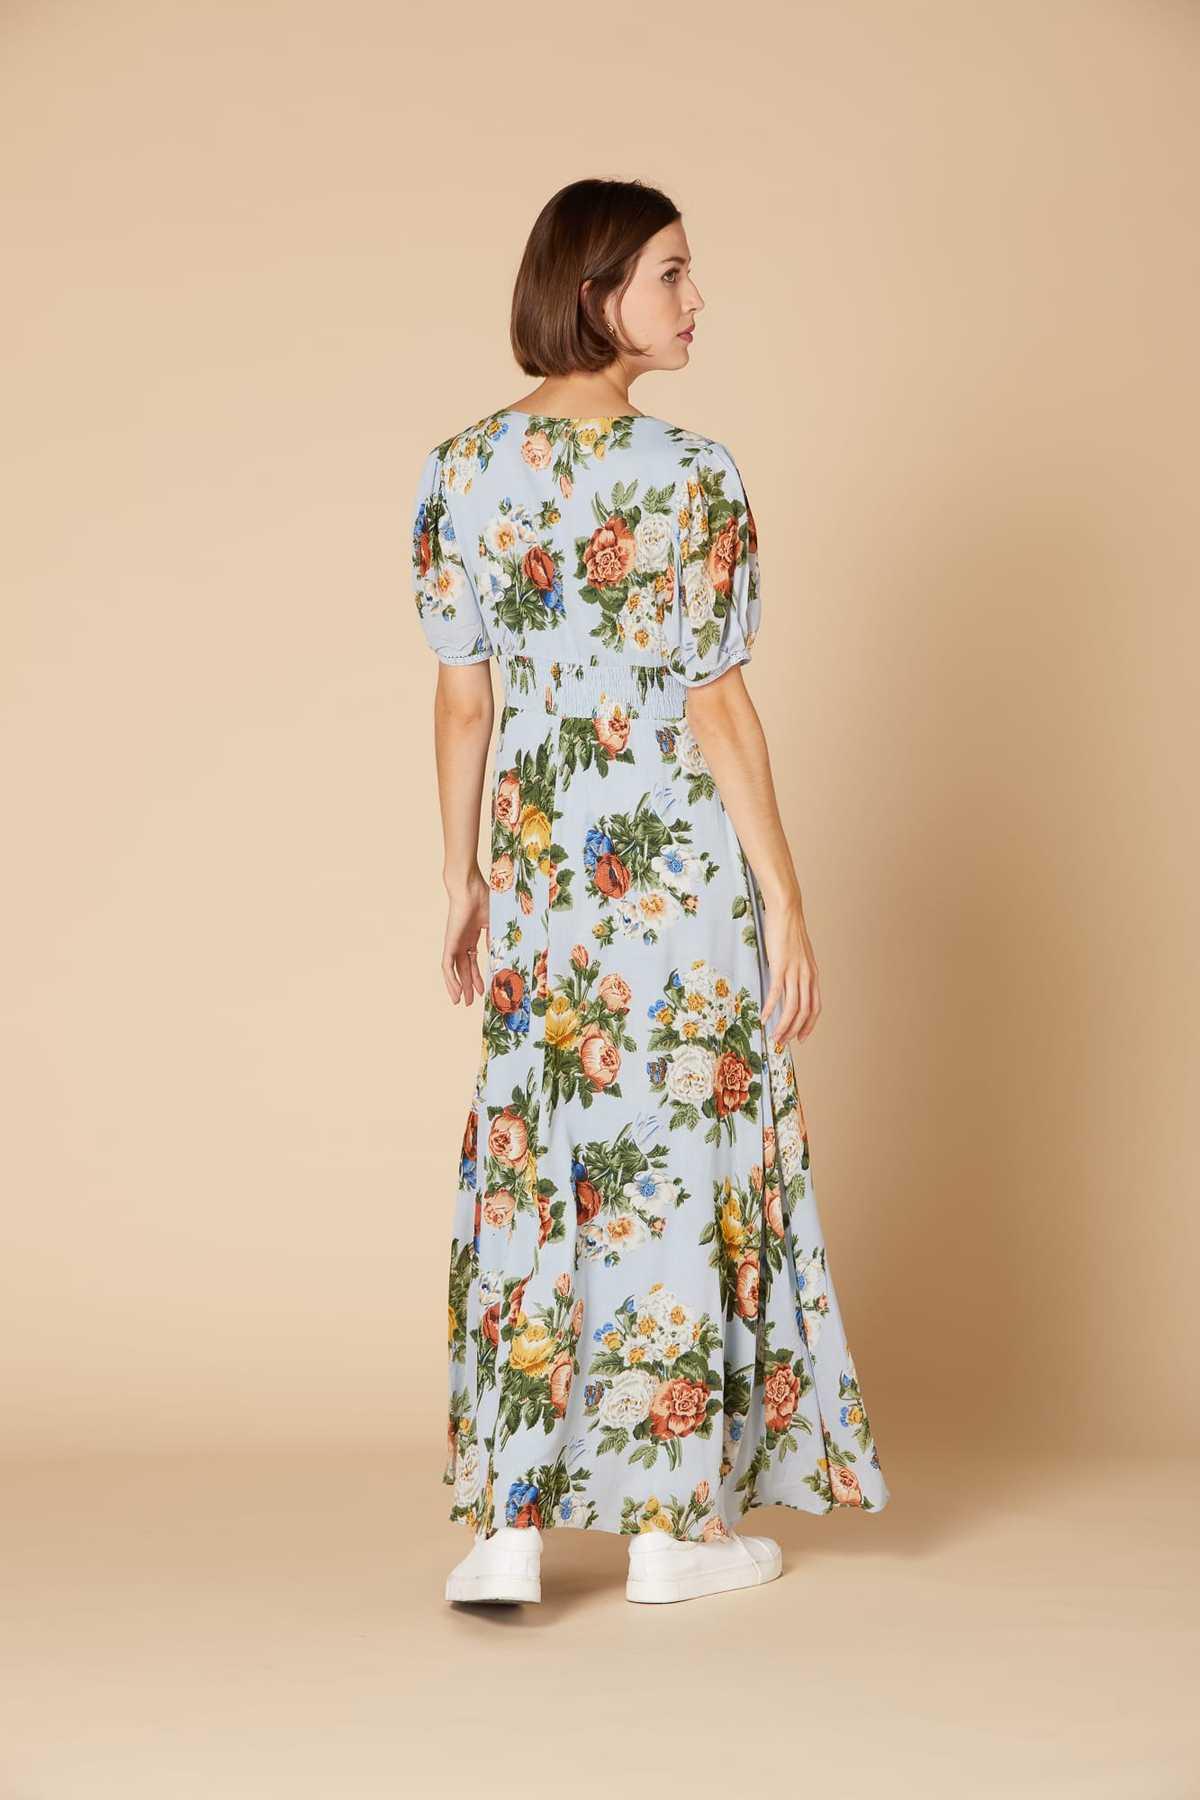 Robe Longue Imprimee A Manches Courtes Calanque Derhy